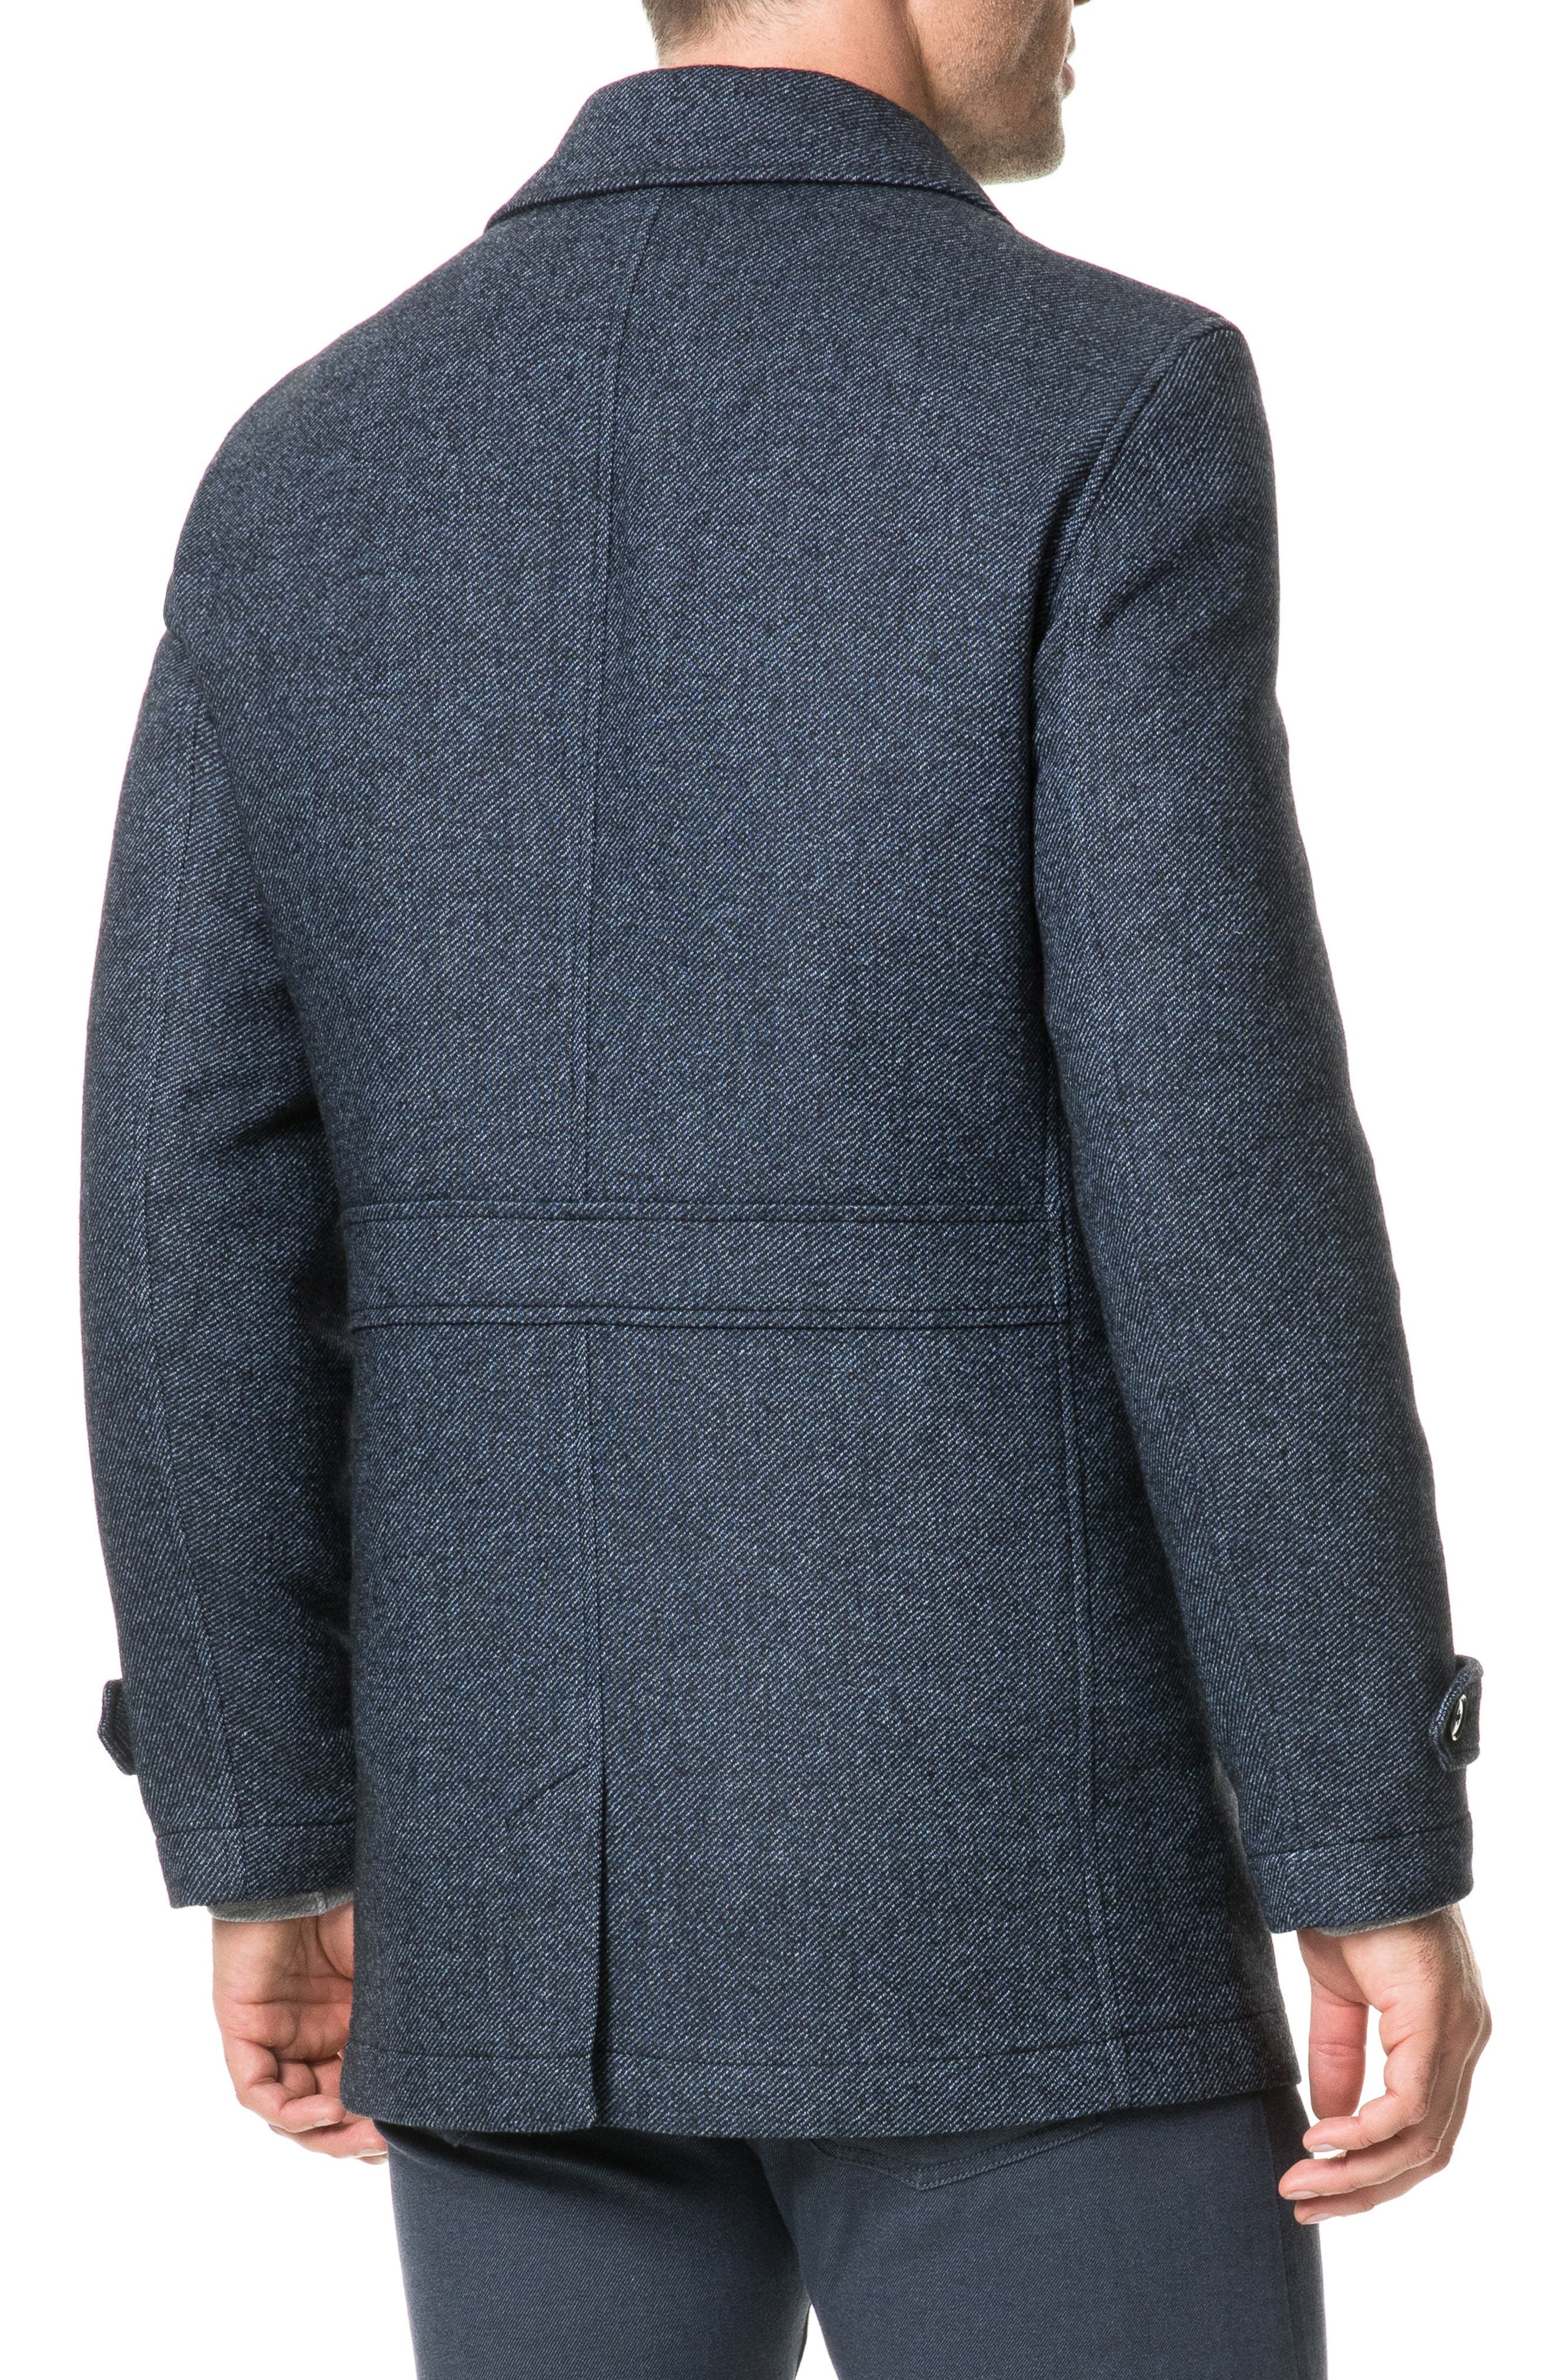 Balmoral Forest Regular Fit Coat,                             Alternate thumbnail 2, color,                             PEACOAT